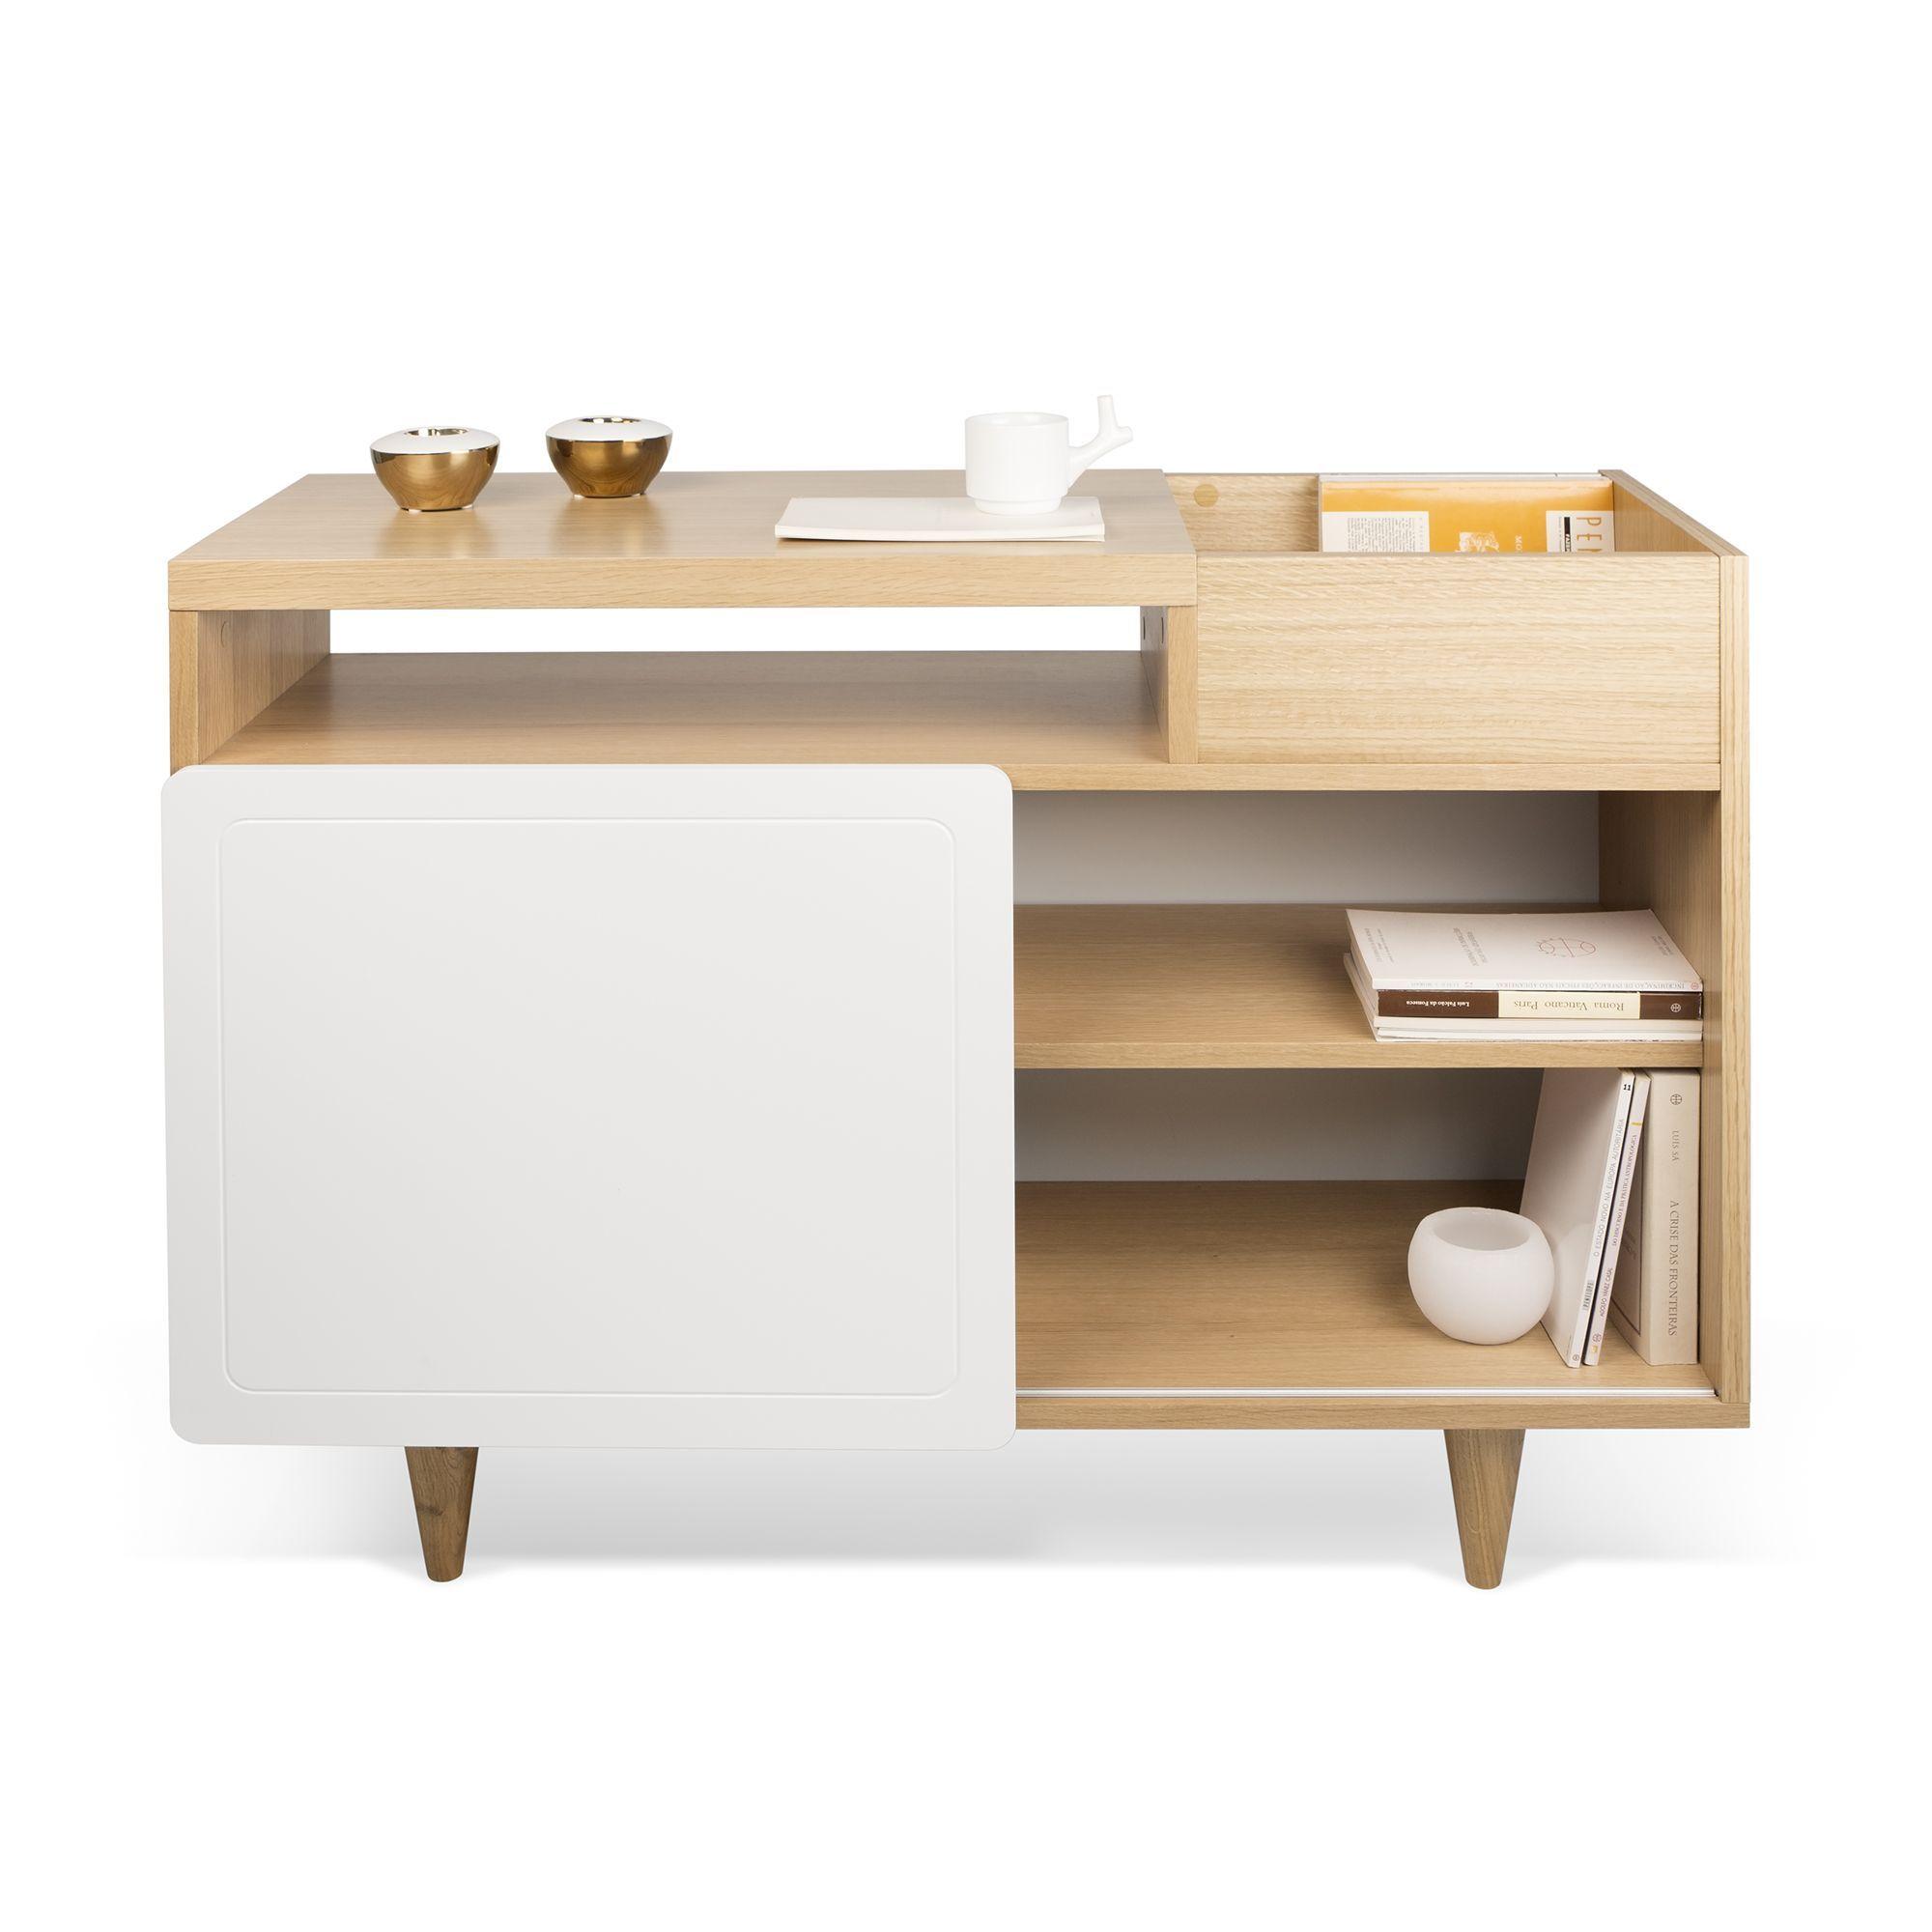 Petit buffet placage chêne finition laqué blanc - Nyla - Buffets-Buffets,  Vaisseliers- 4e60f960c77c